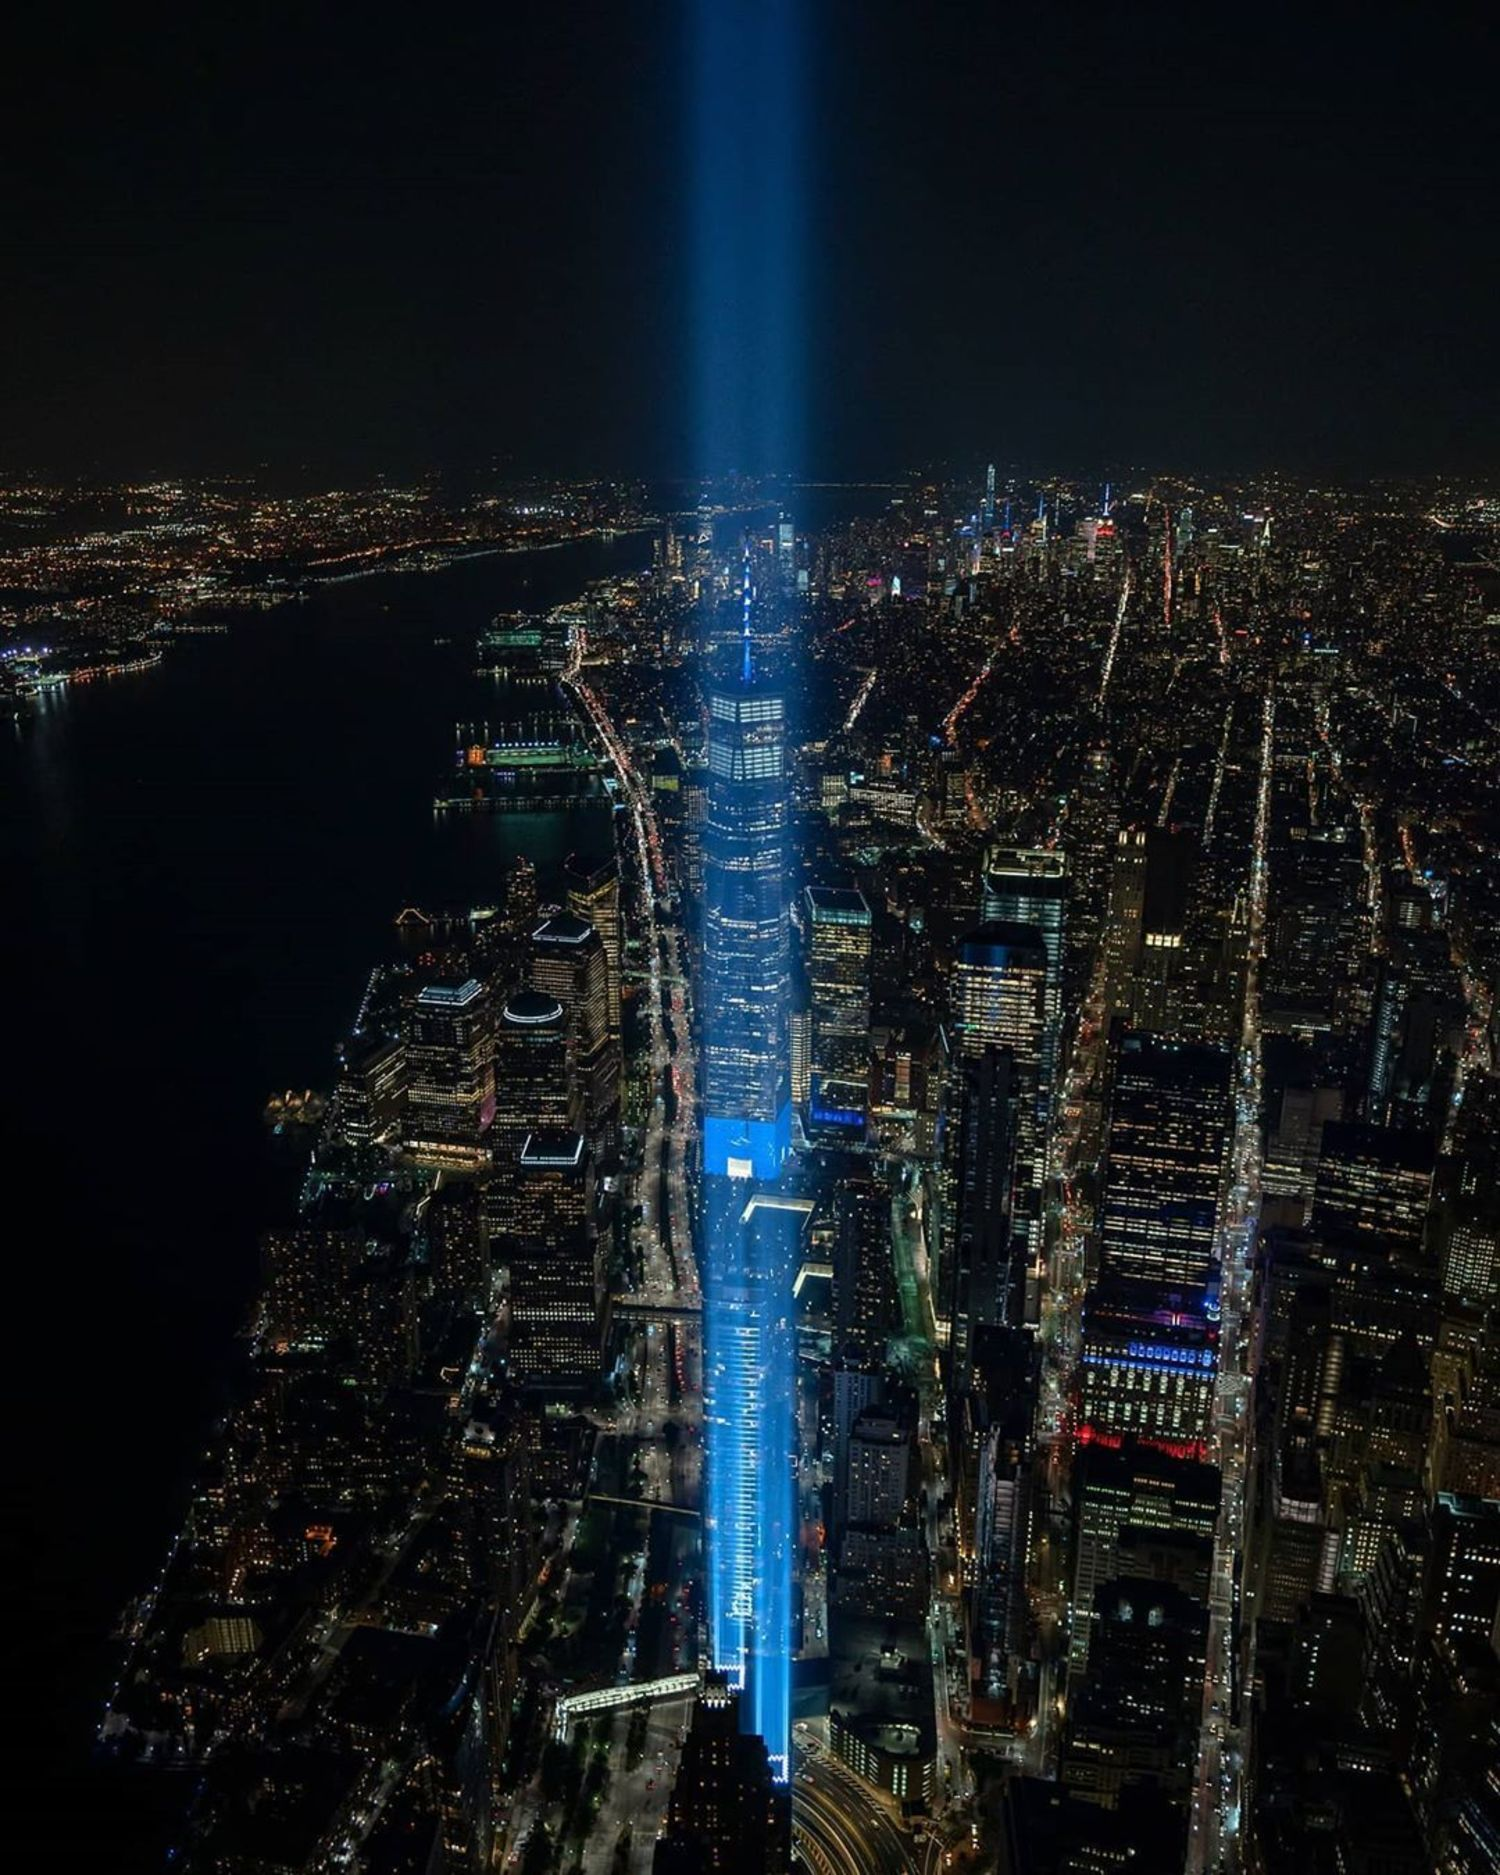 World Trade Center Tribute in Light, Lower Manhattan